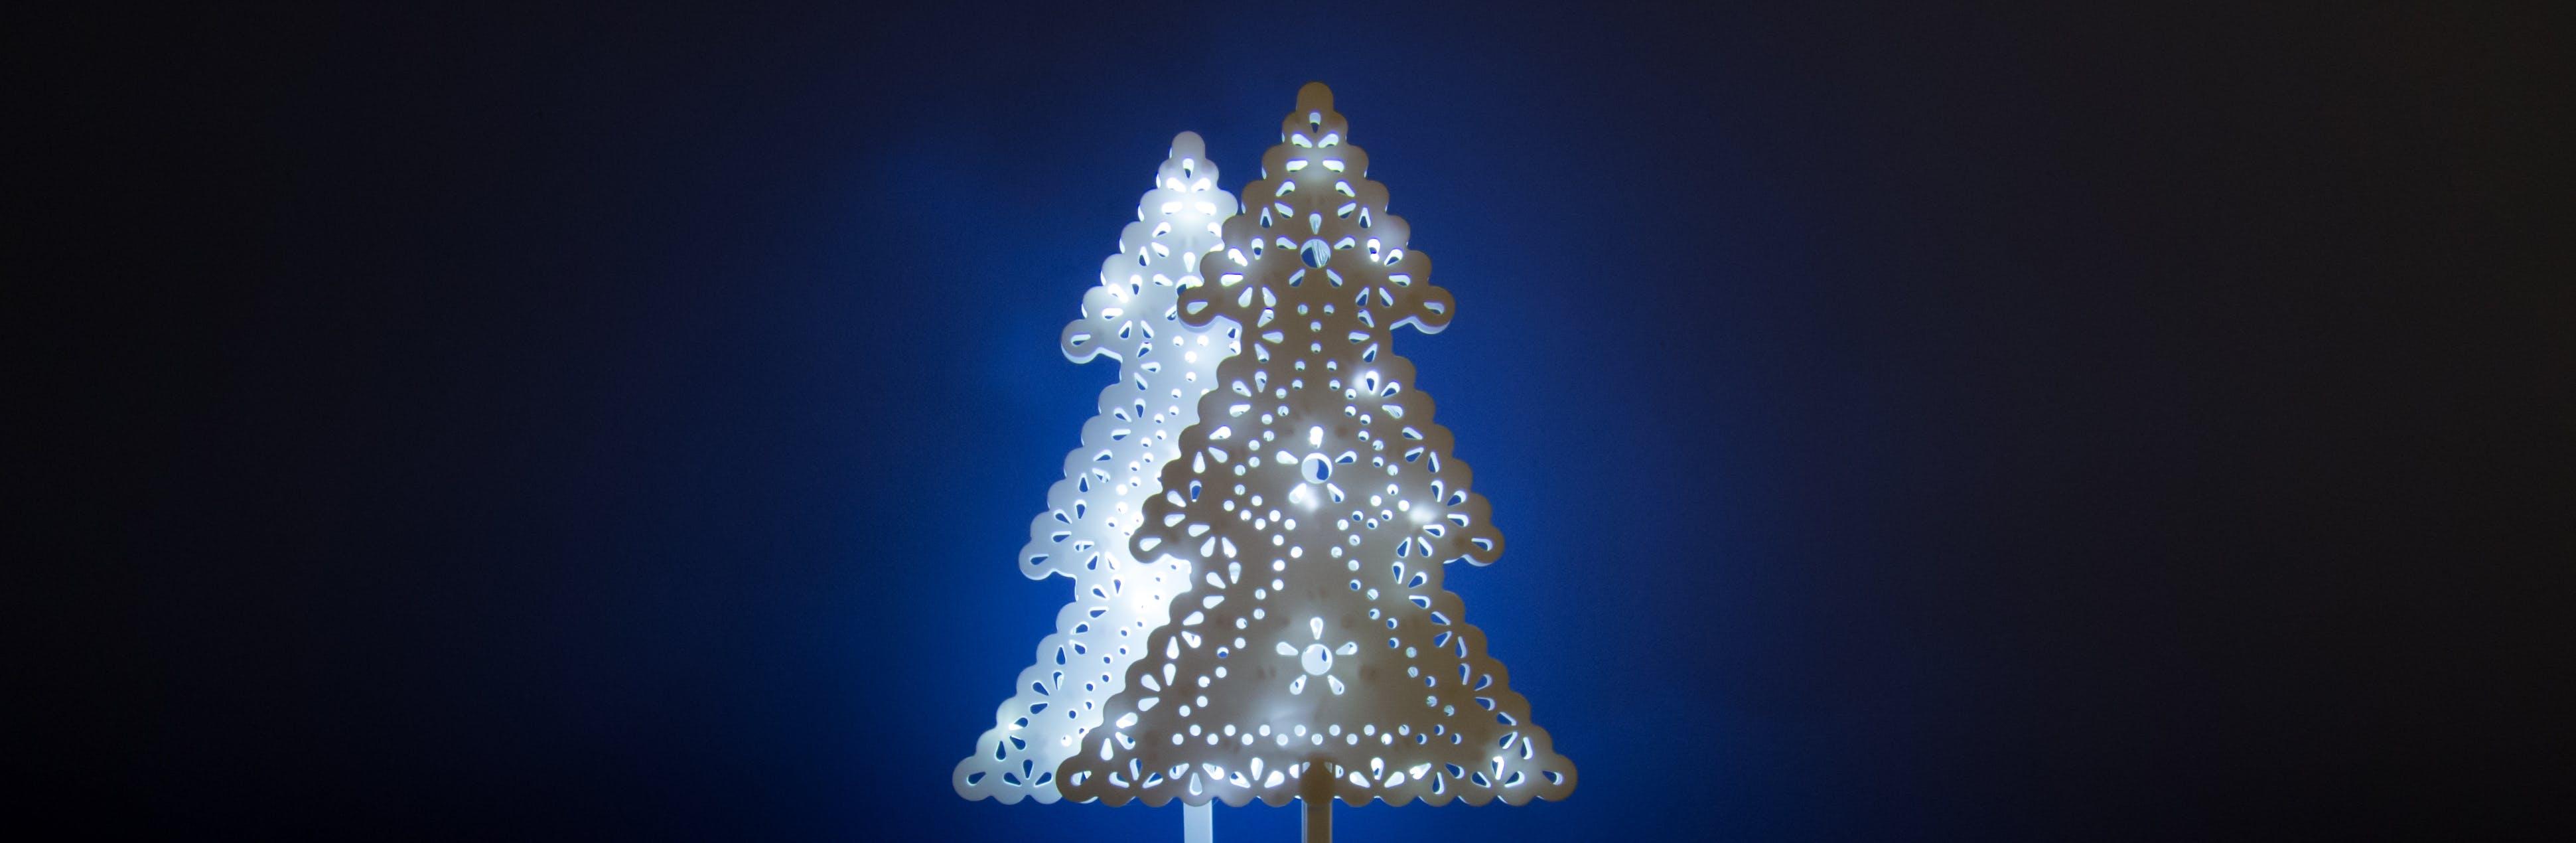 Free stock photo of light, holiday, blue, tree